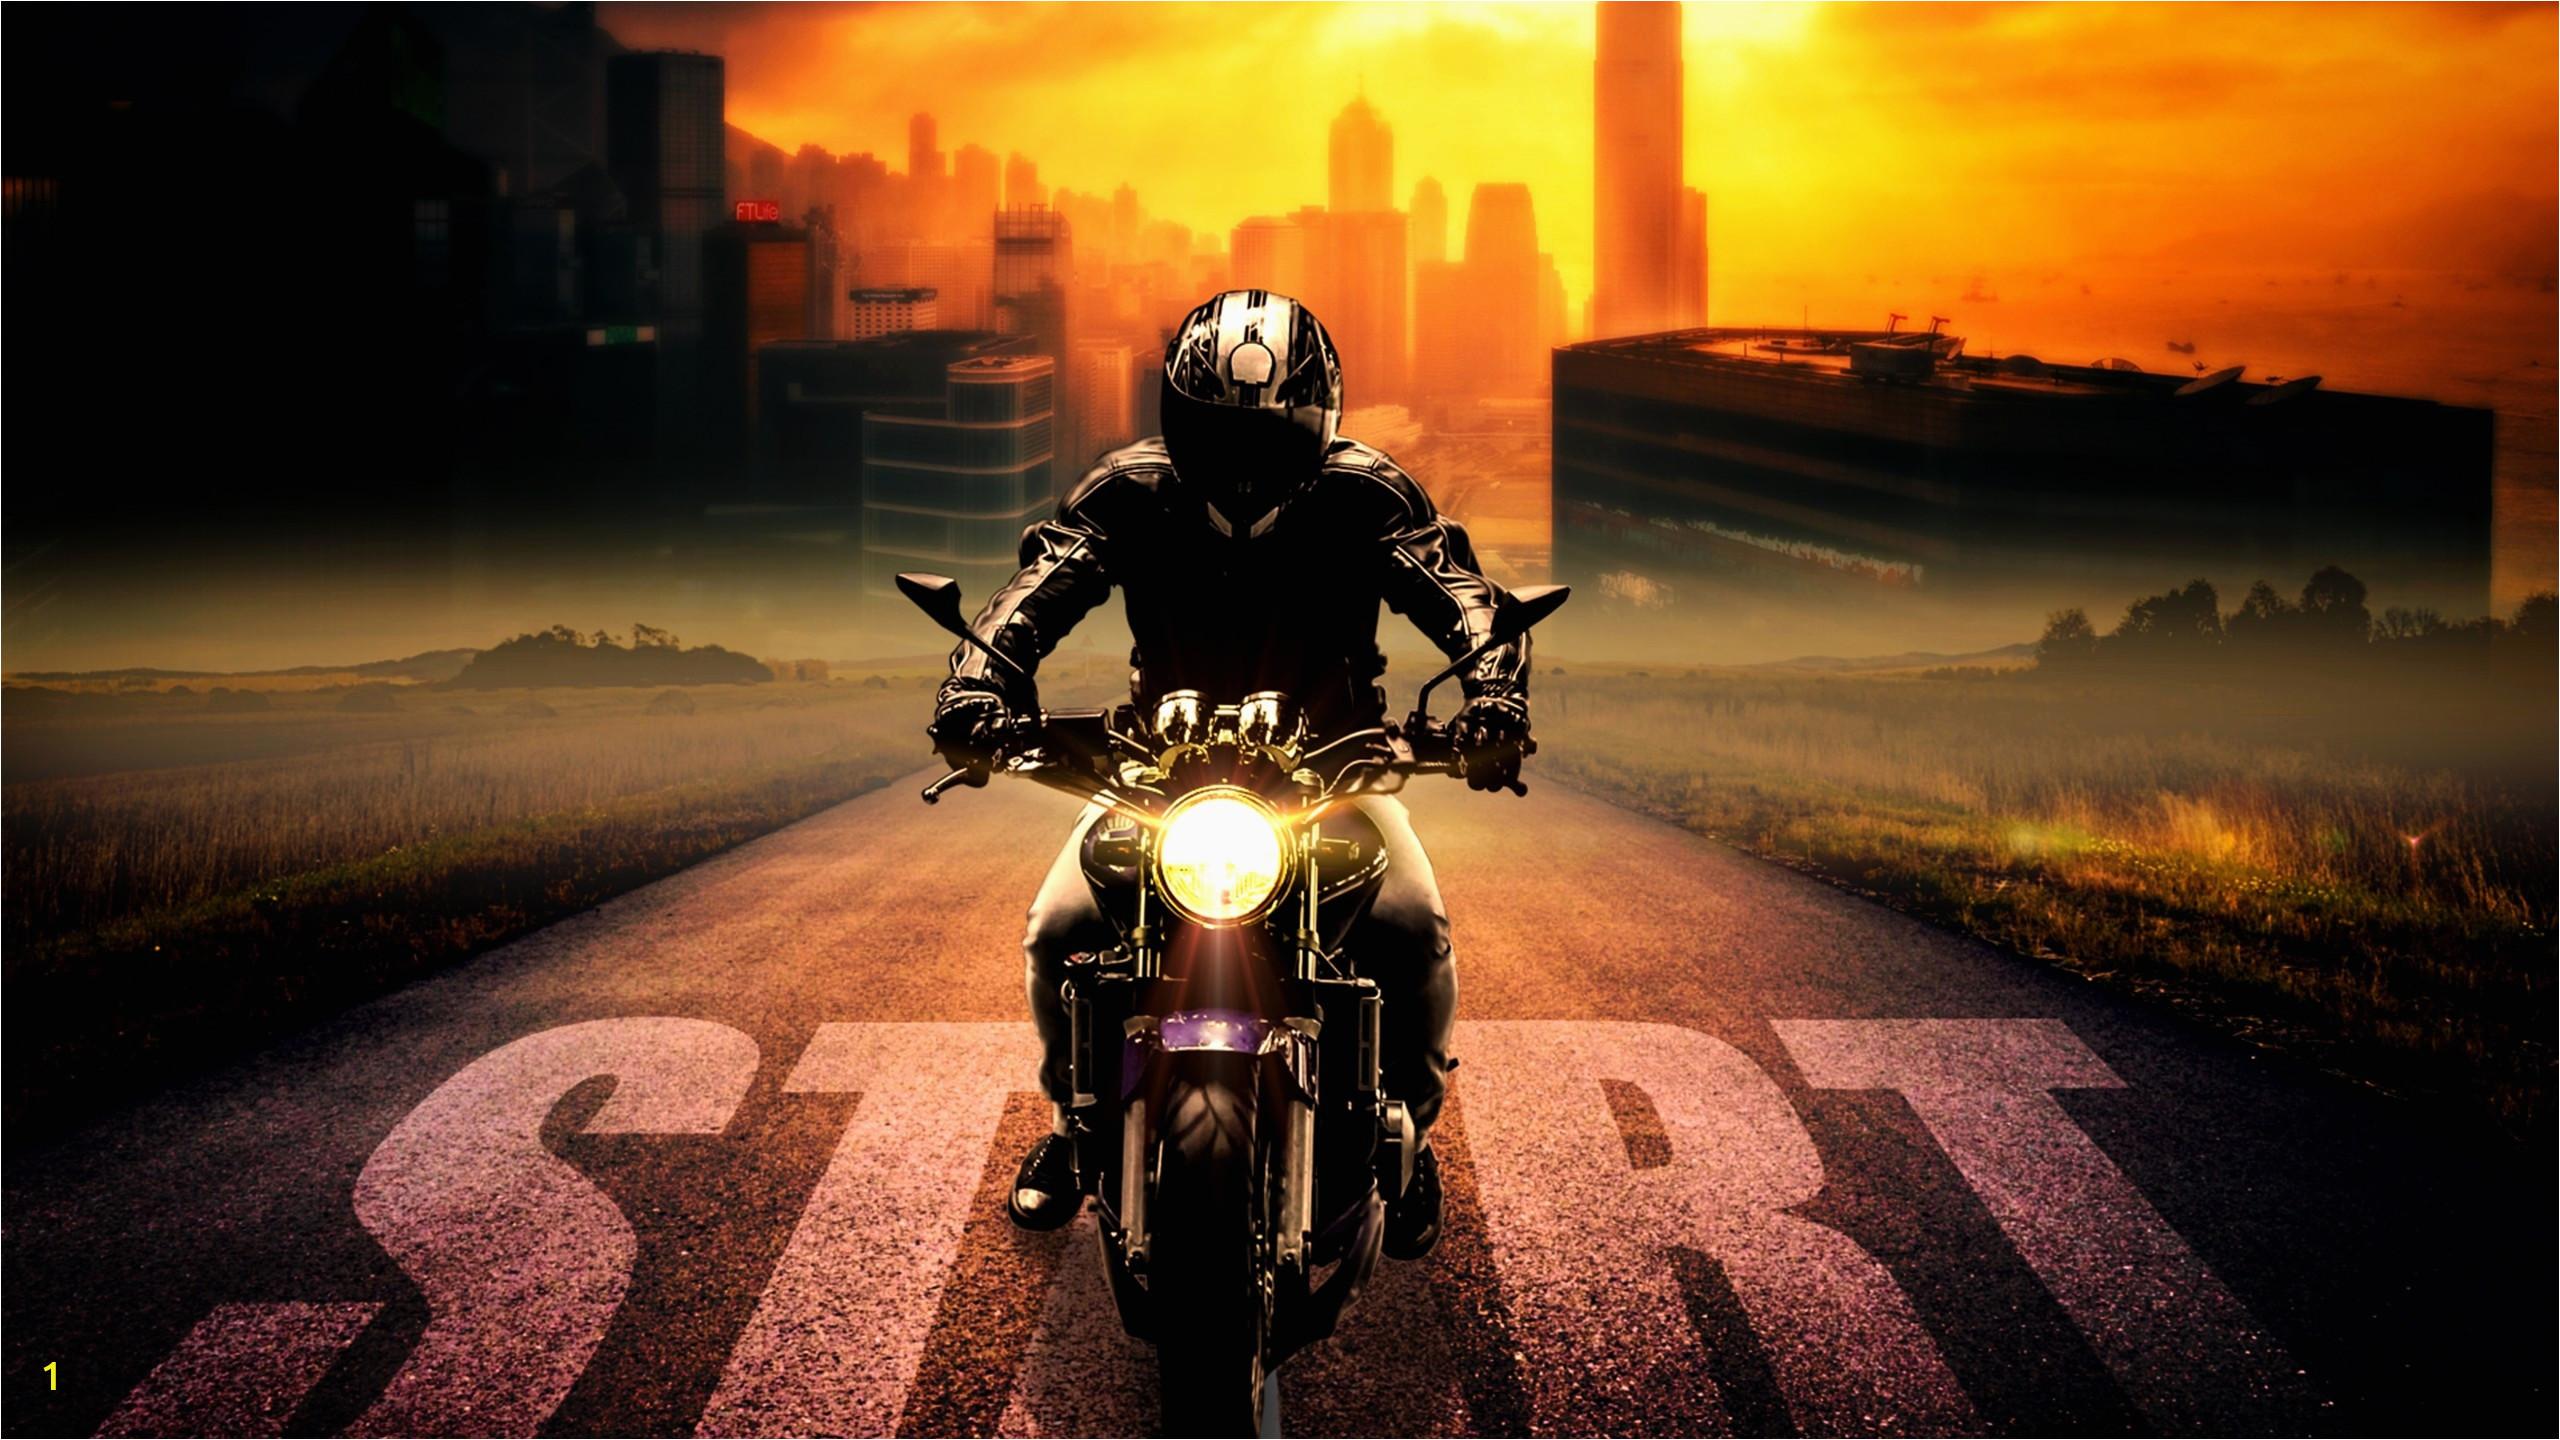 bikers wallpaper elegant wallpaper biker motorcycle ride start night 4k 8k automotive bikes bination of bikers wallpaper